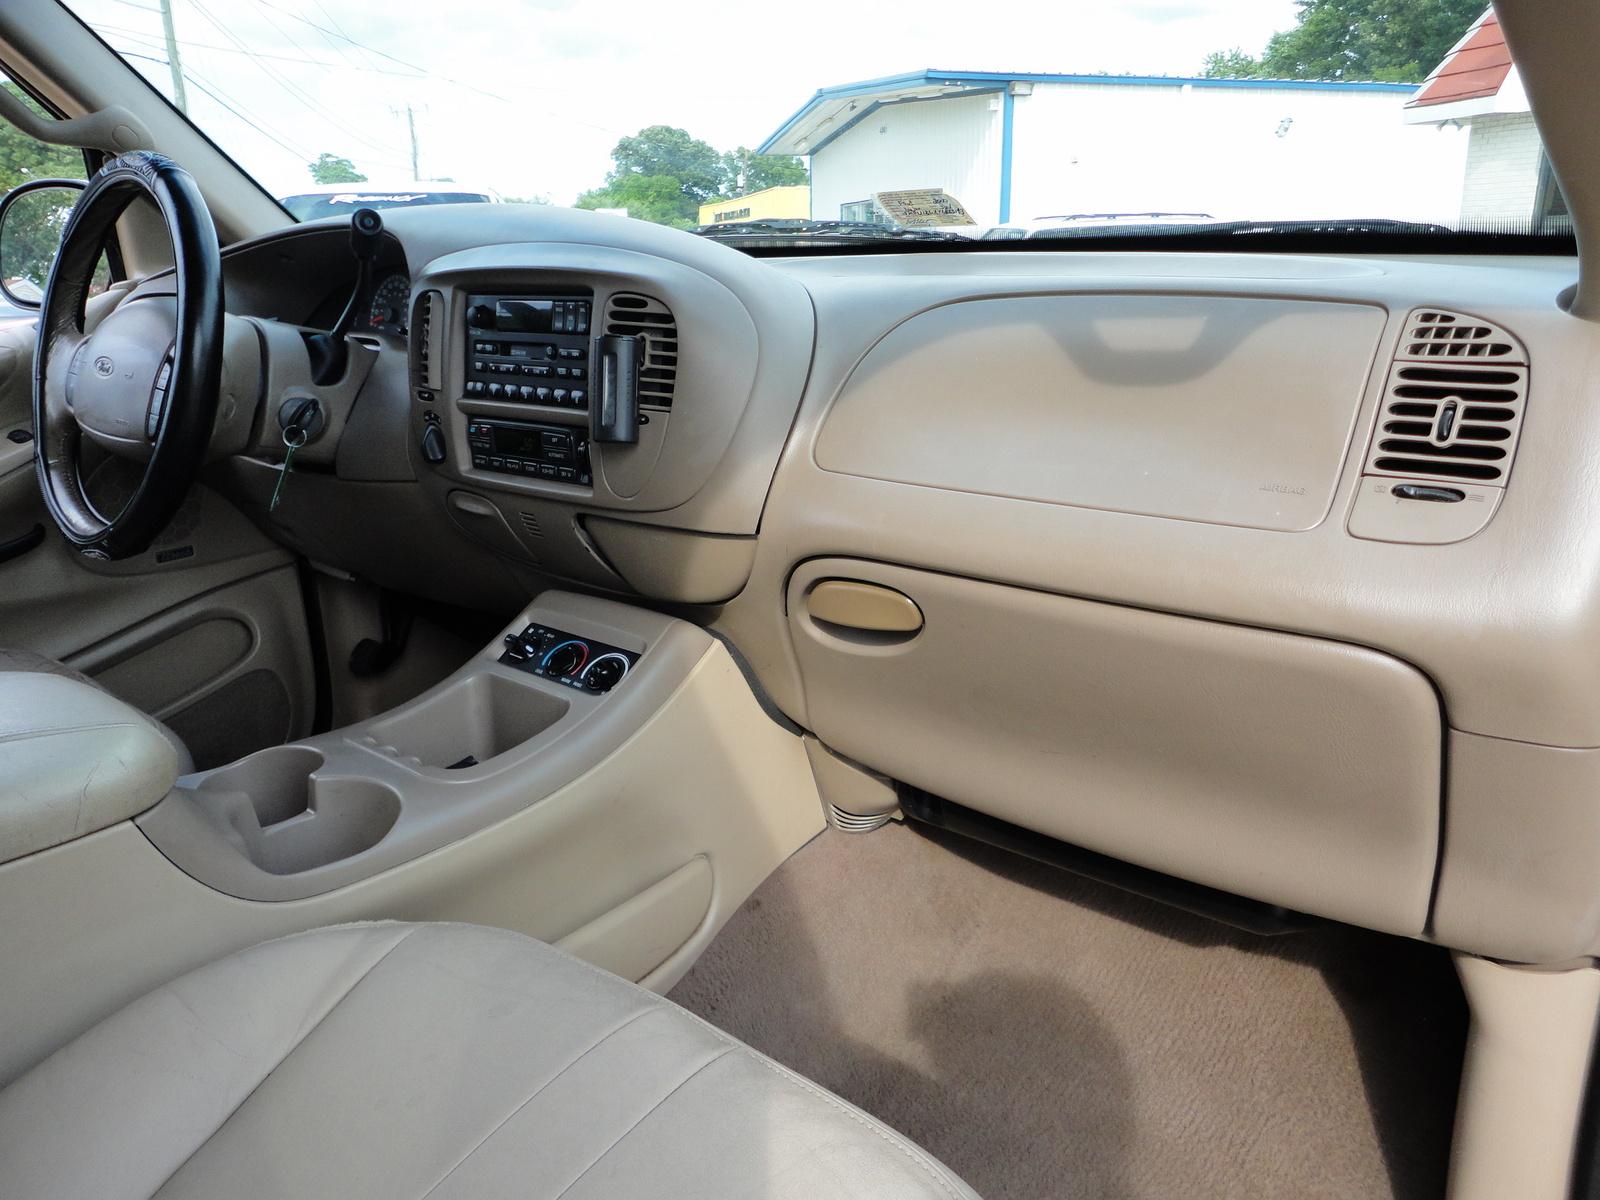 2000 Ford Excursion Interior Colors